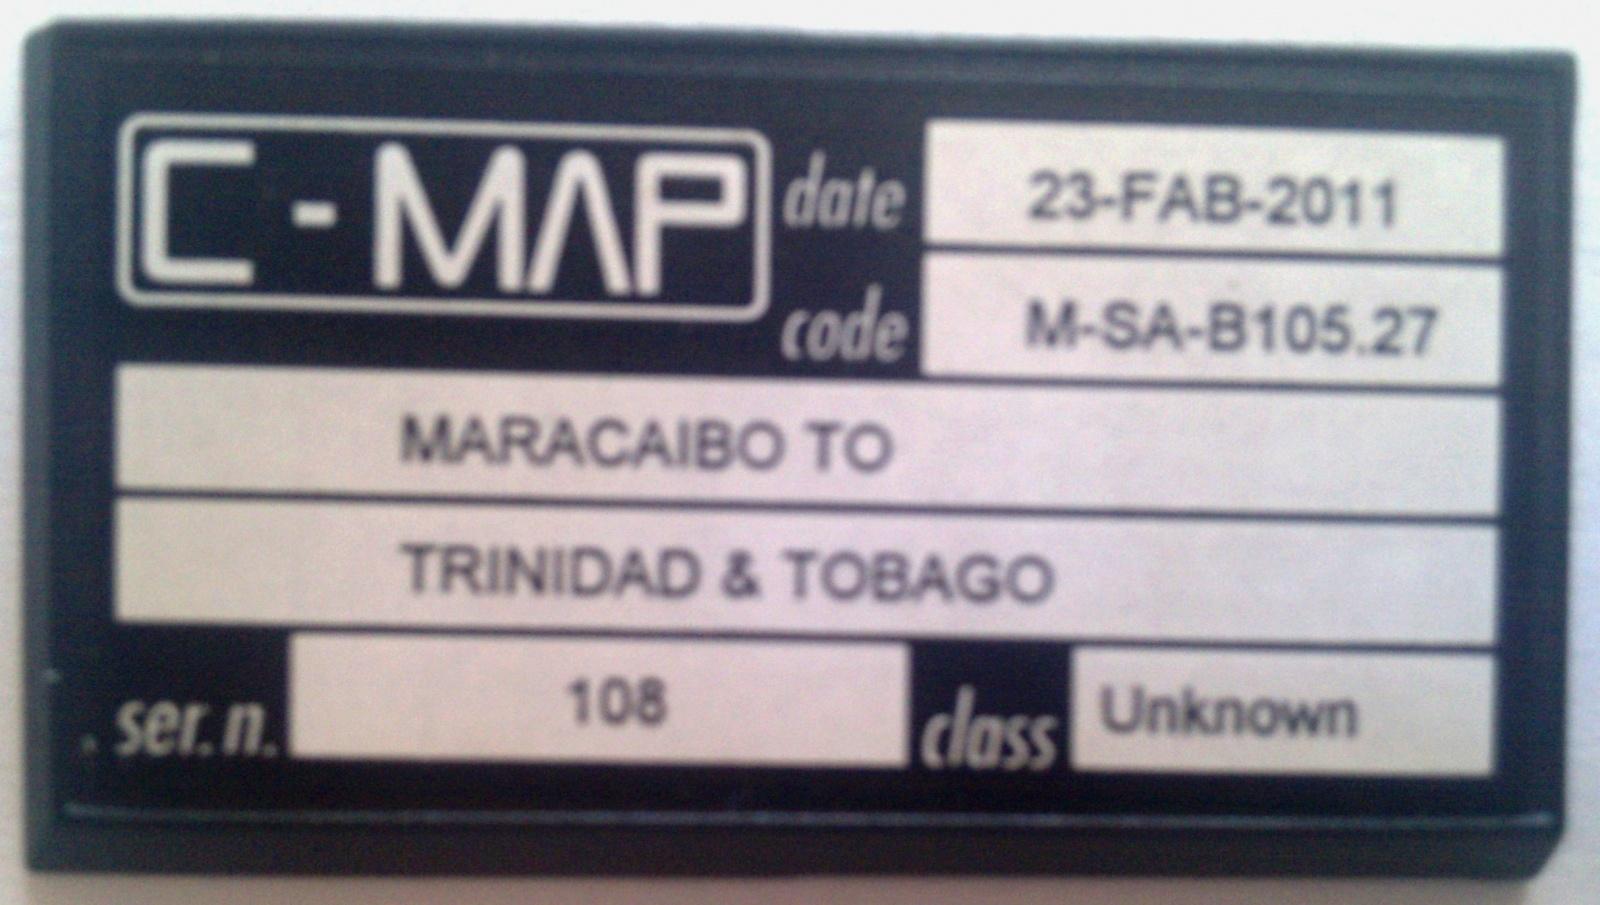 Click image for larger version  Name:C - Map Maracaibo to Trinidad & Tobago.jpg Views:116 Size:373.9 KB ID:41397